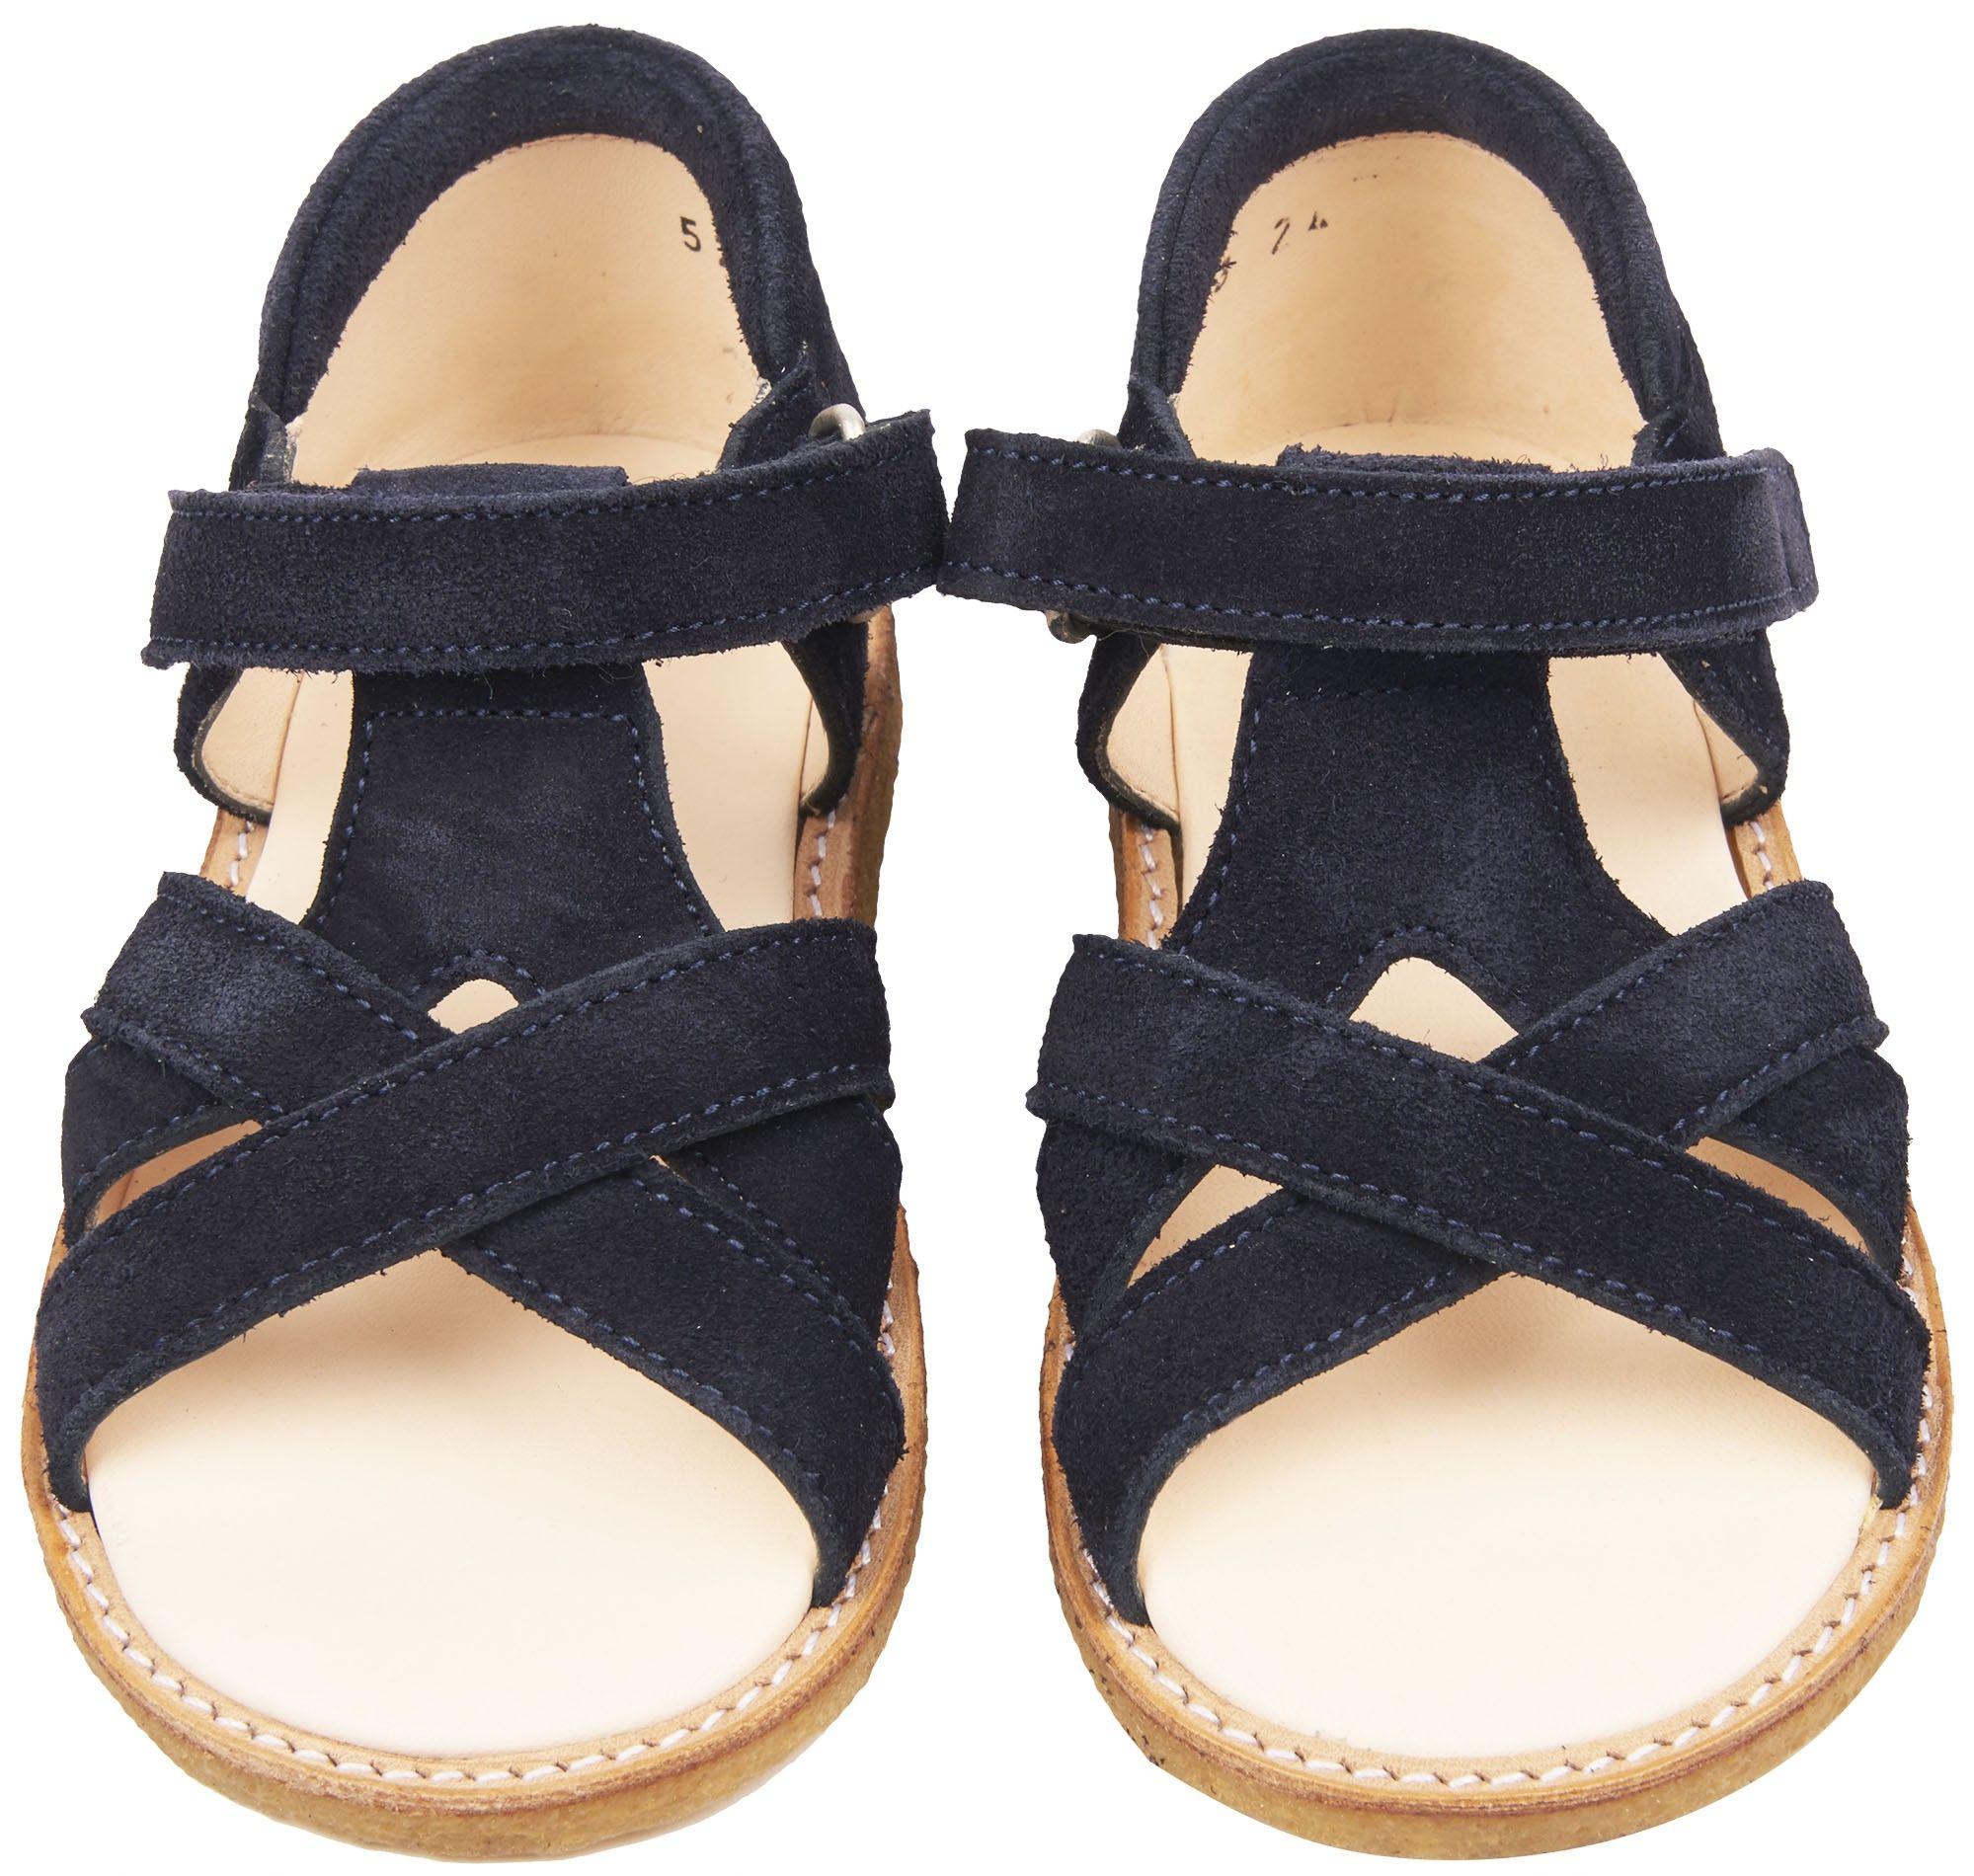 Velcro baby sandals